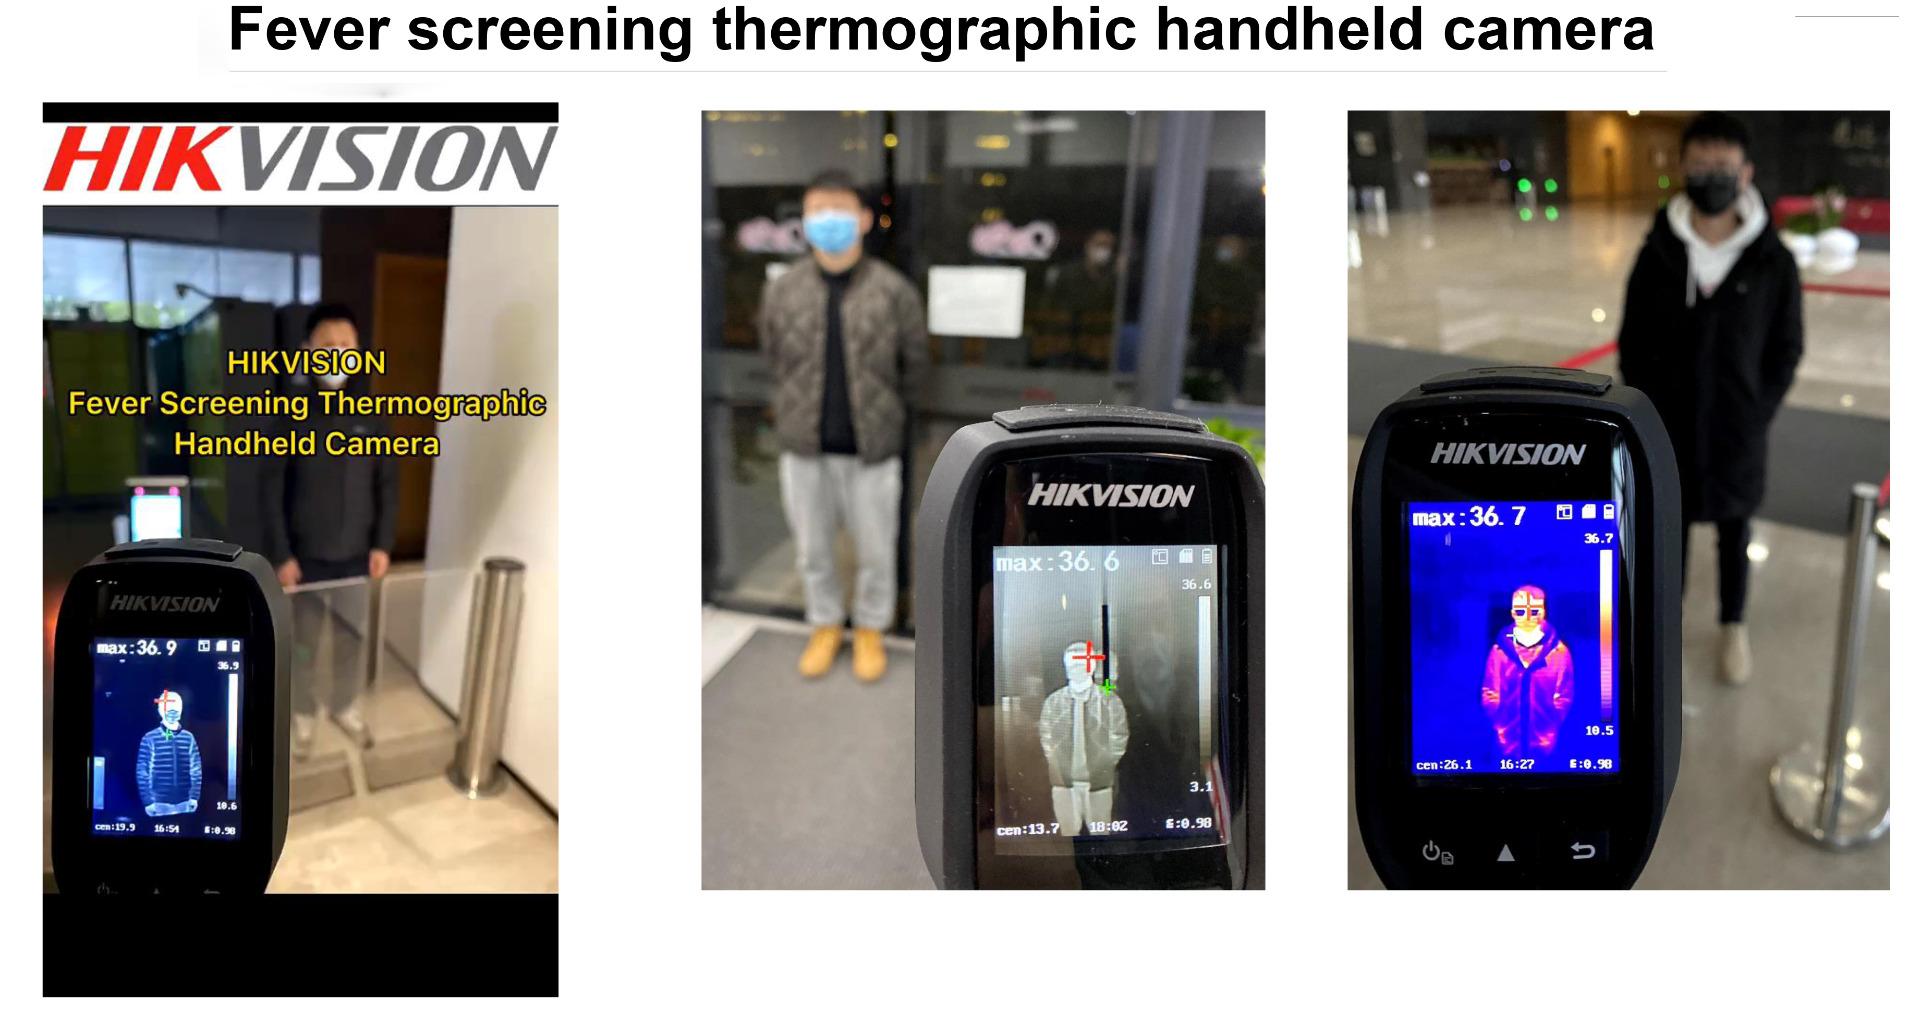 Fever screening thermographic handheld camera